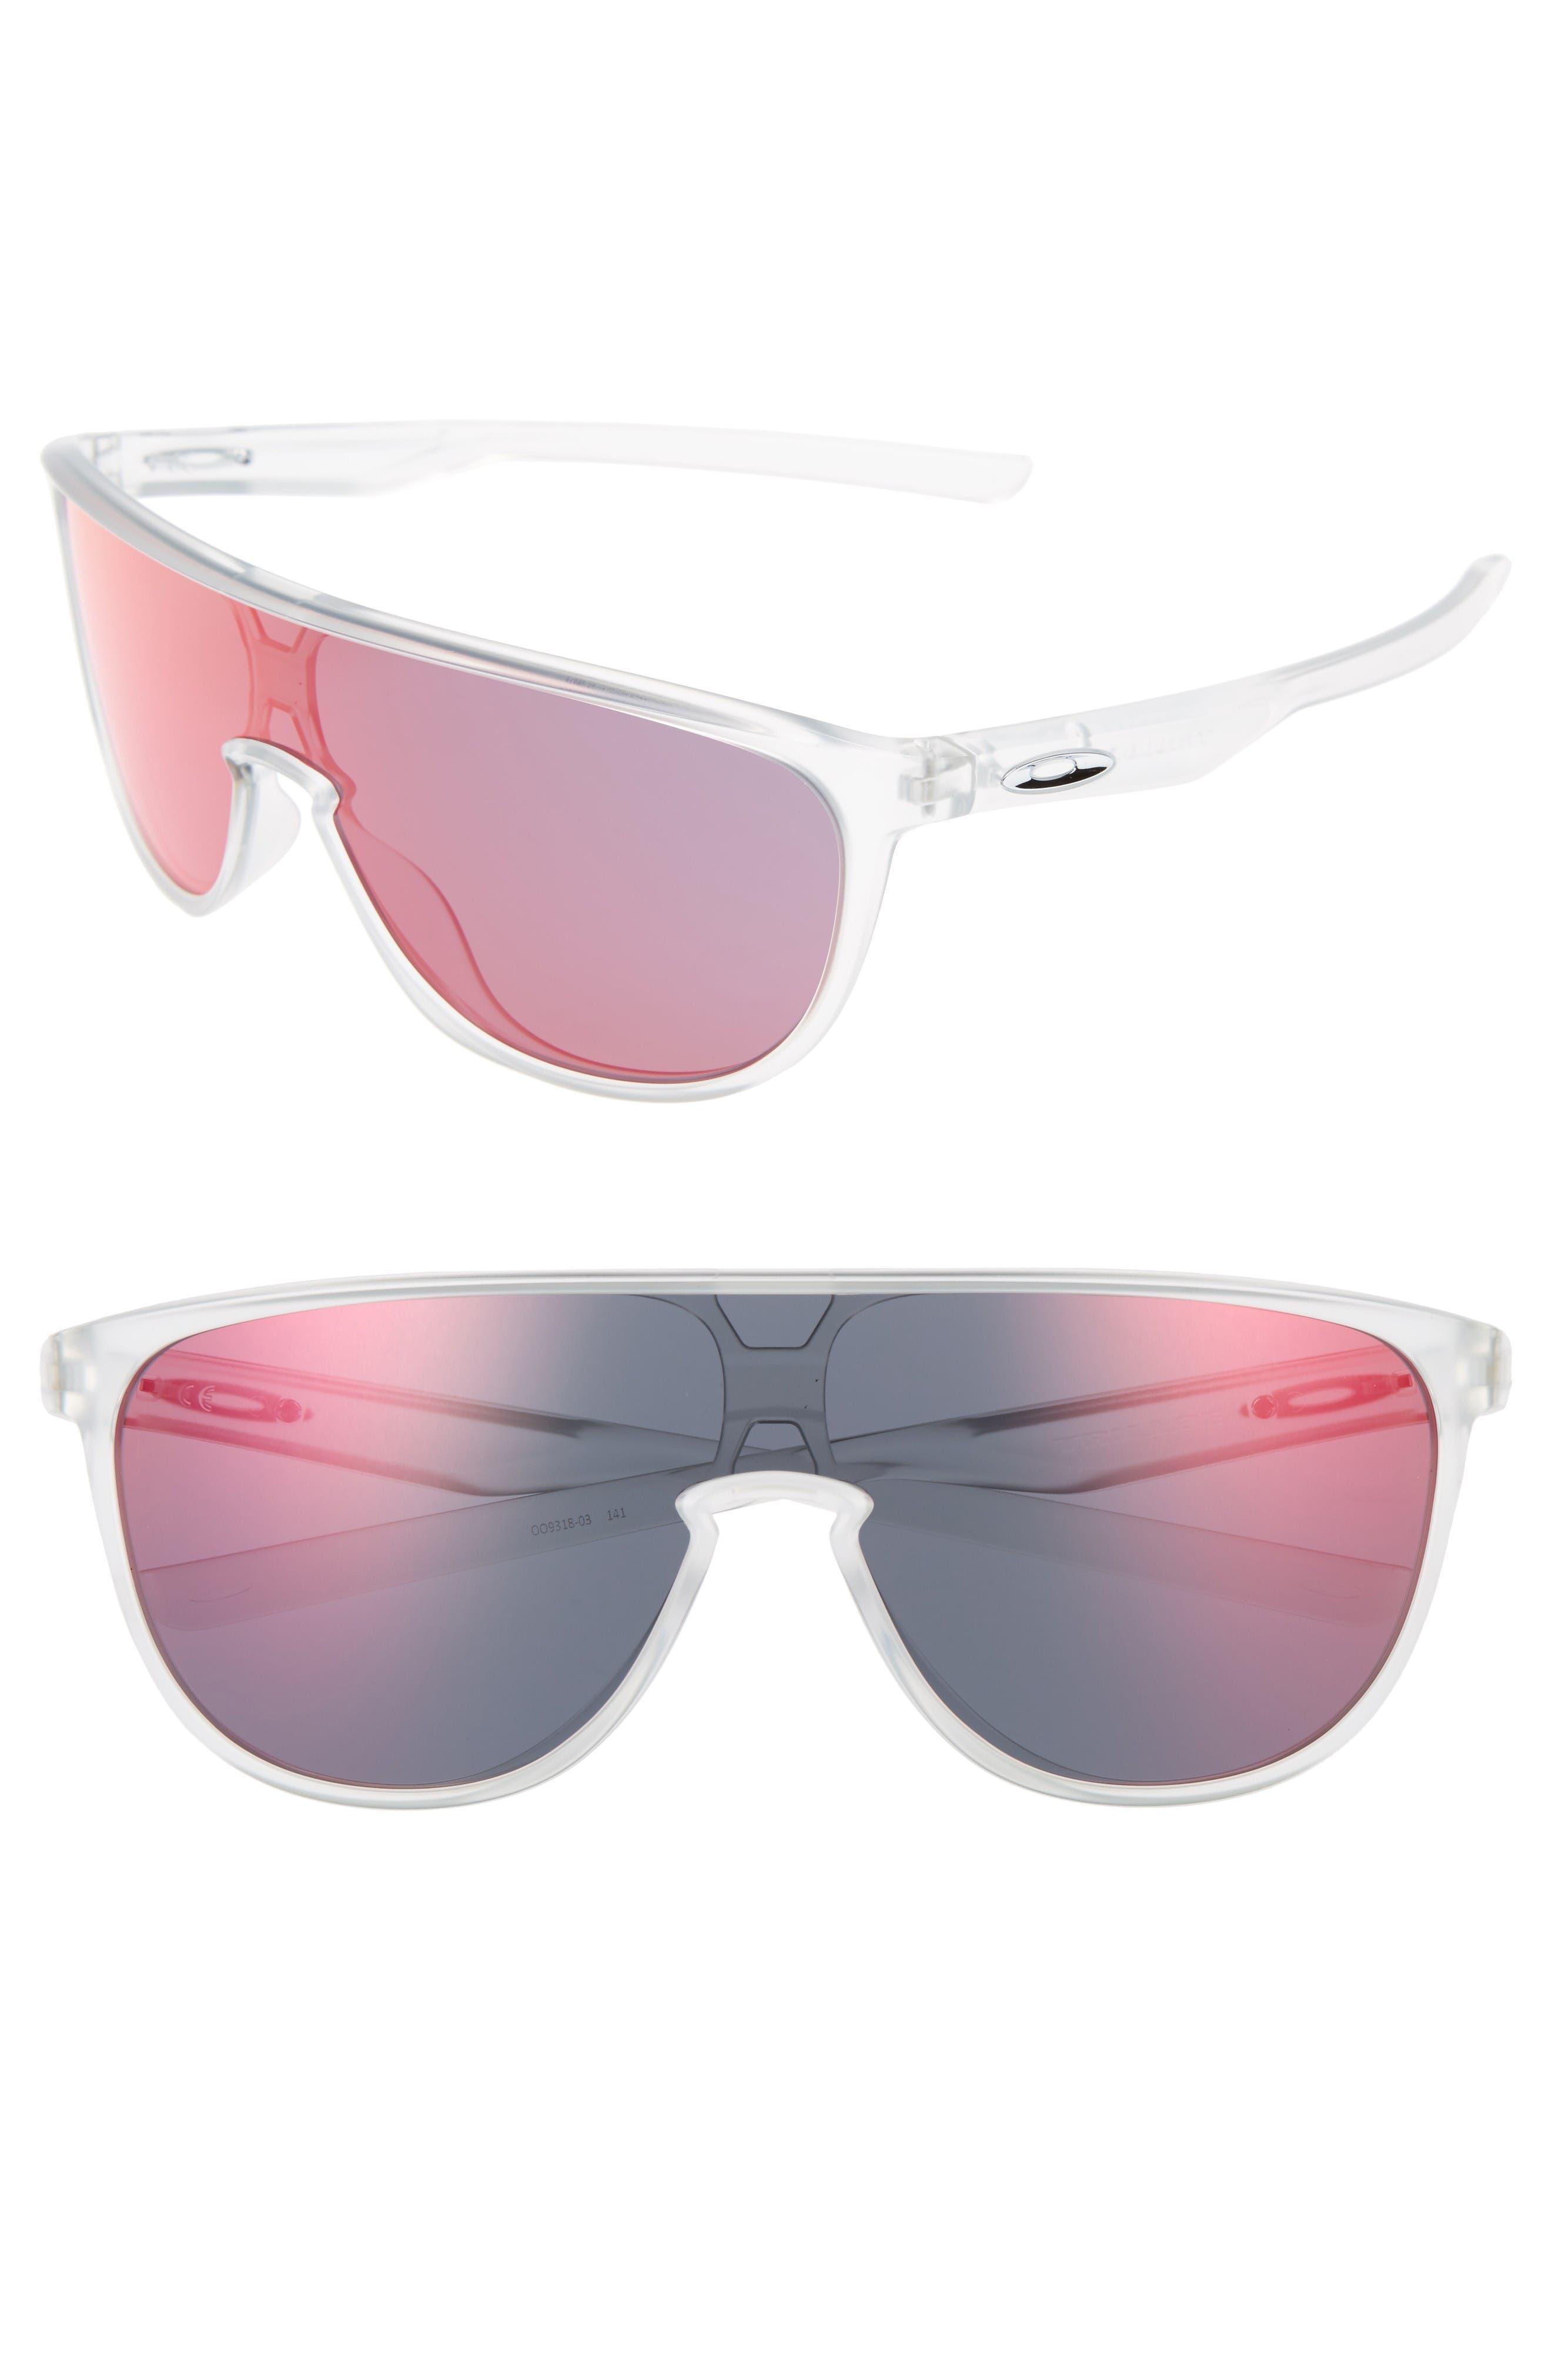 Oakley Trillbe 140mm Shield Sunglasses